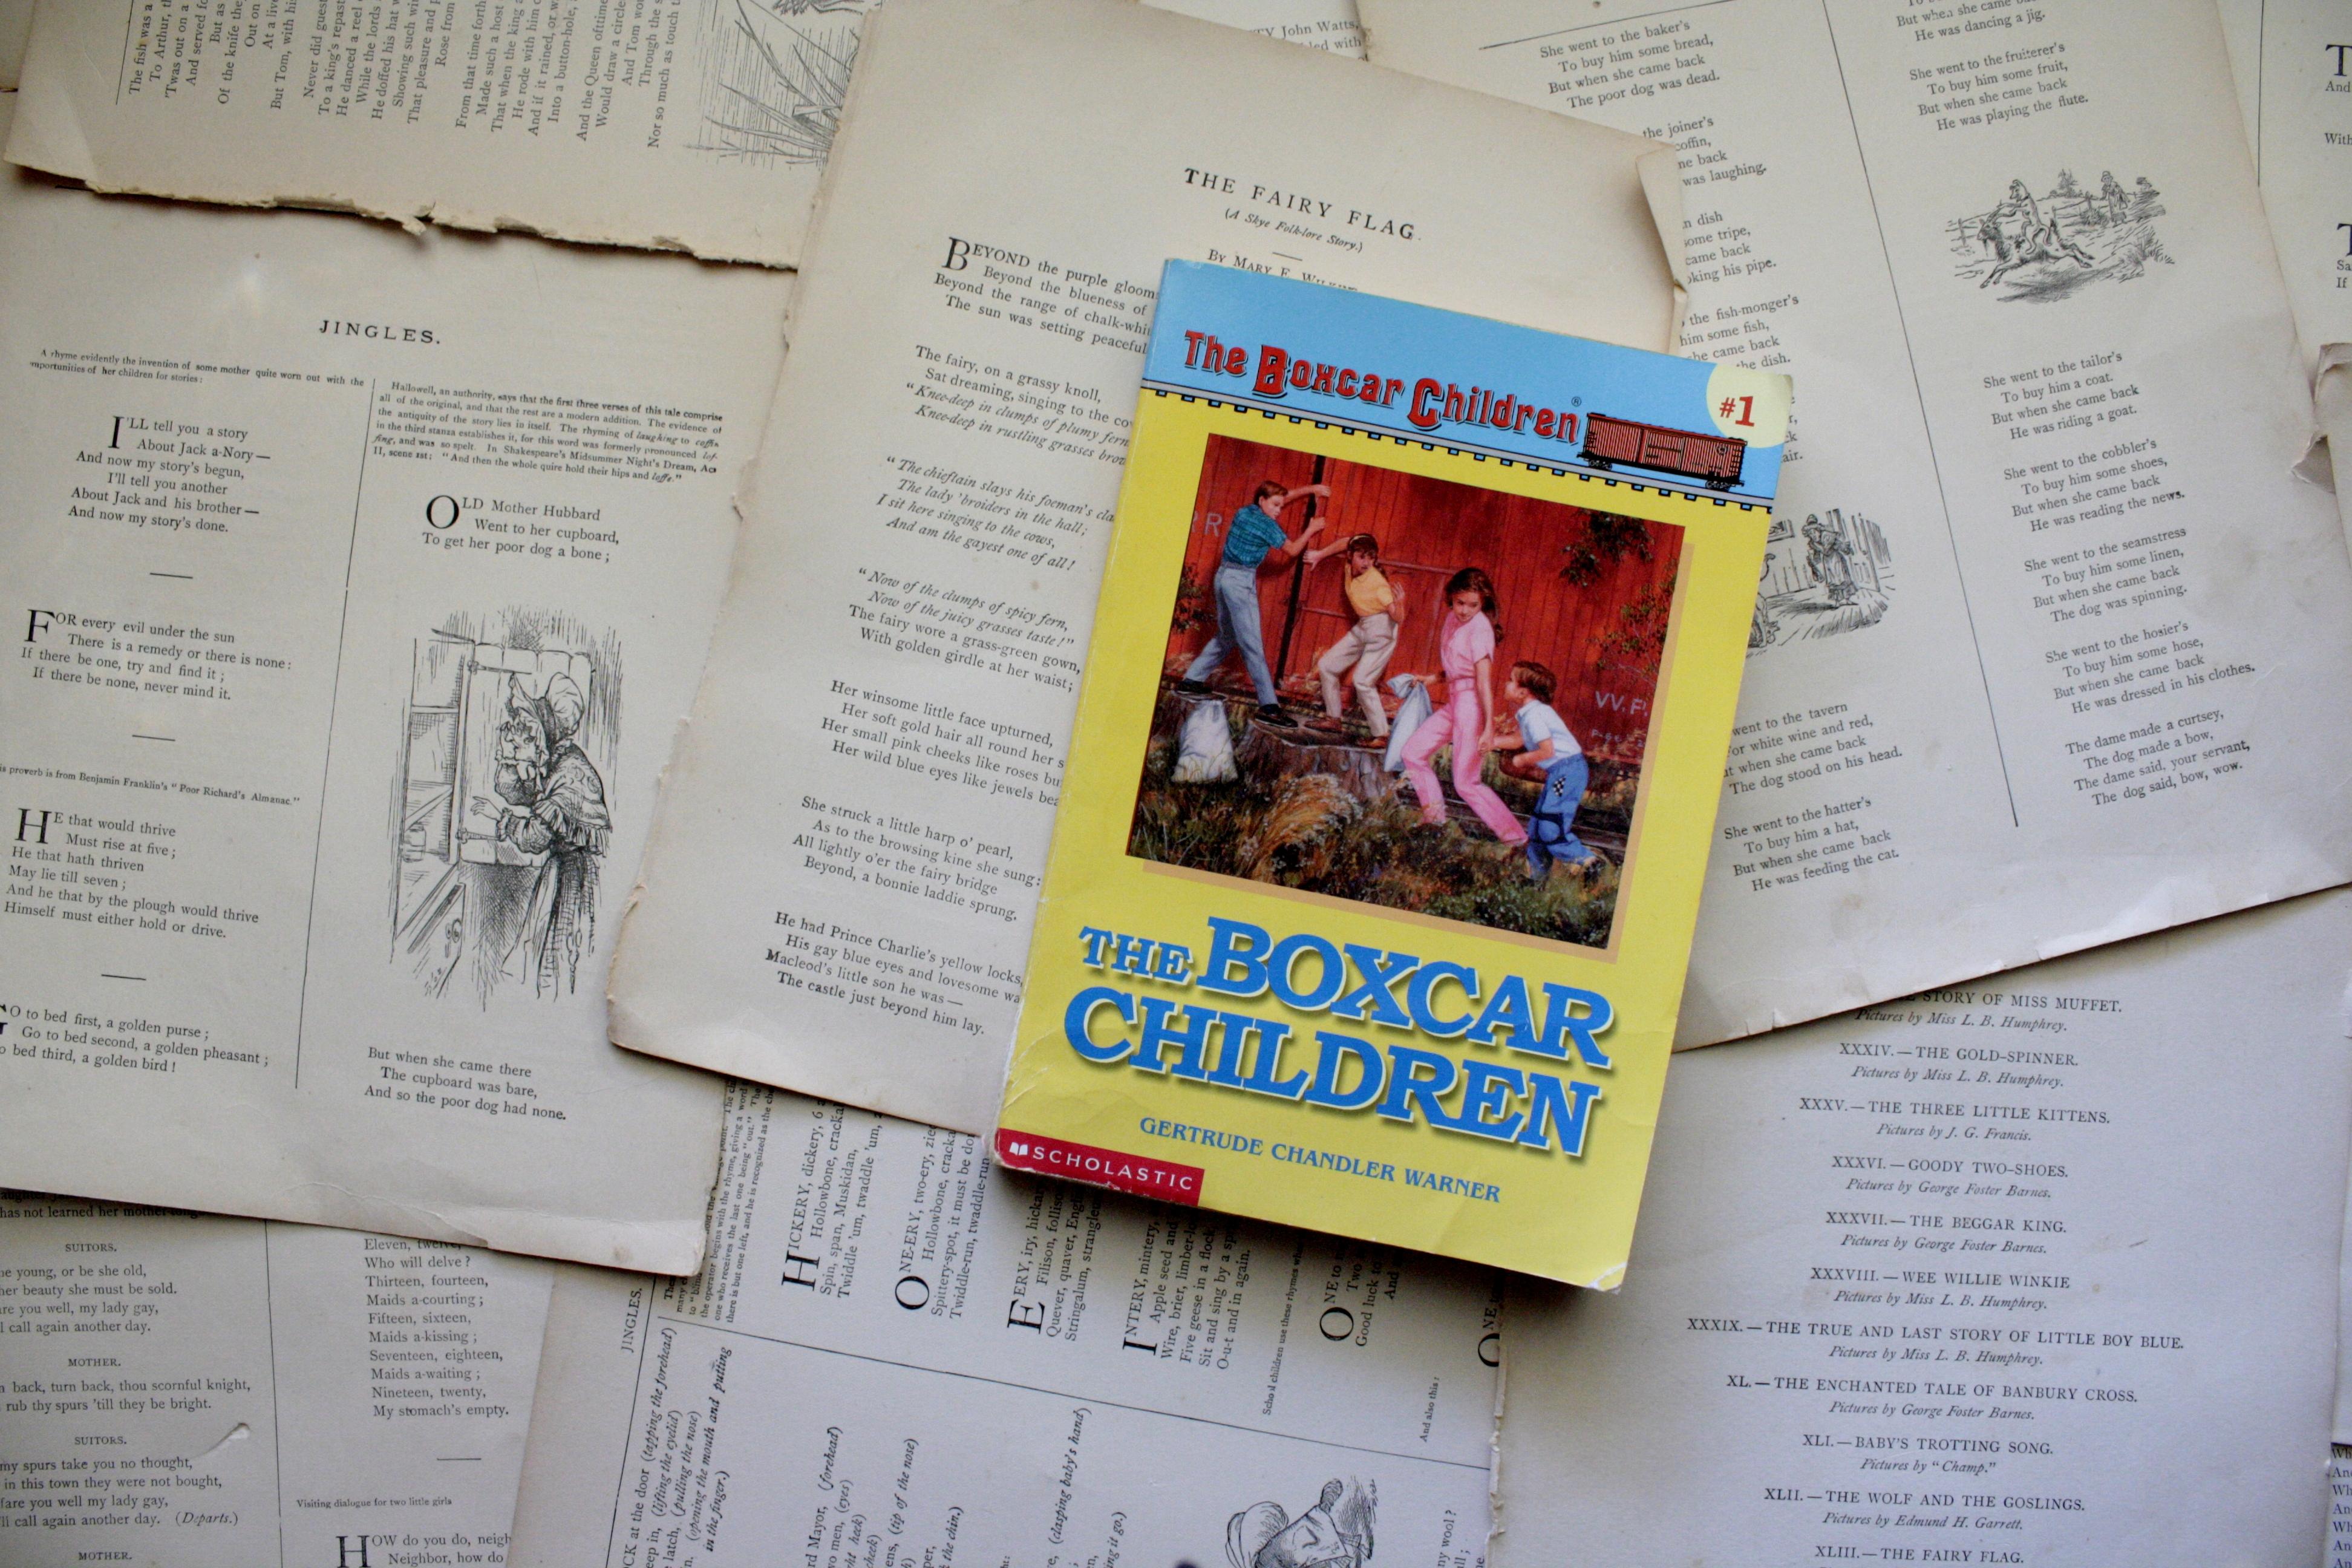 The Boxcar Children | Gertrude Chandler Warner